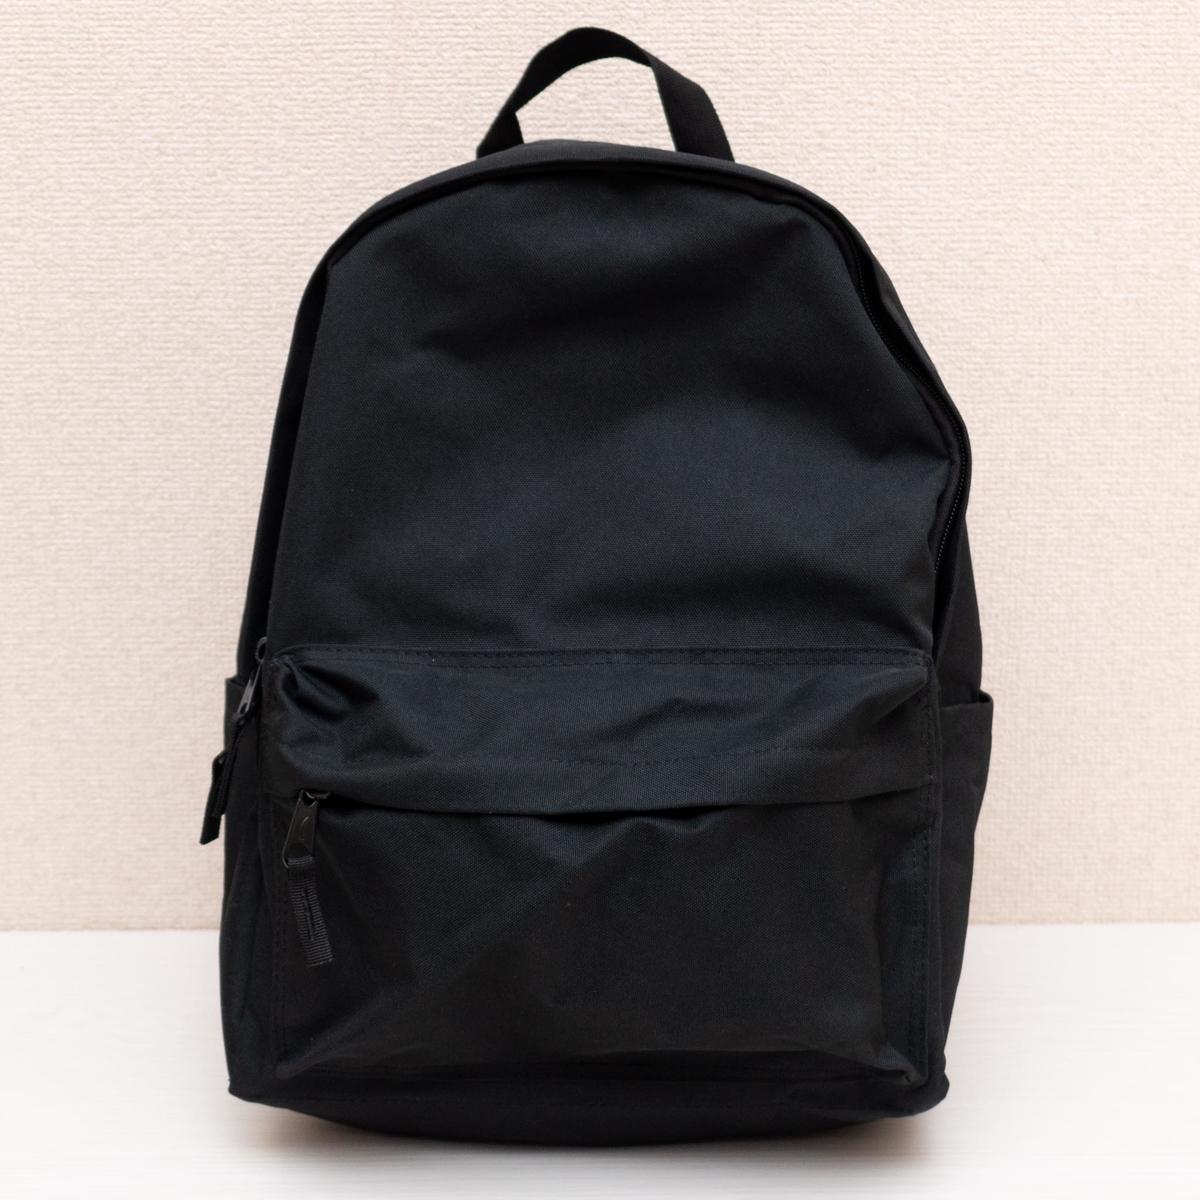 f:id:yamada0221:20200505232545j:plain